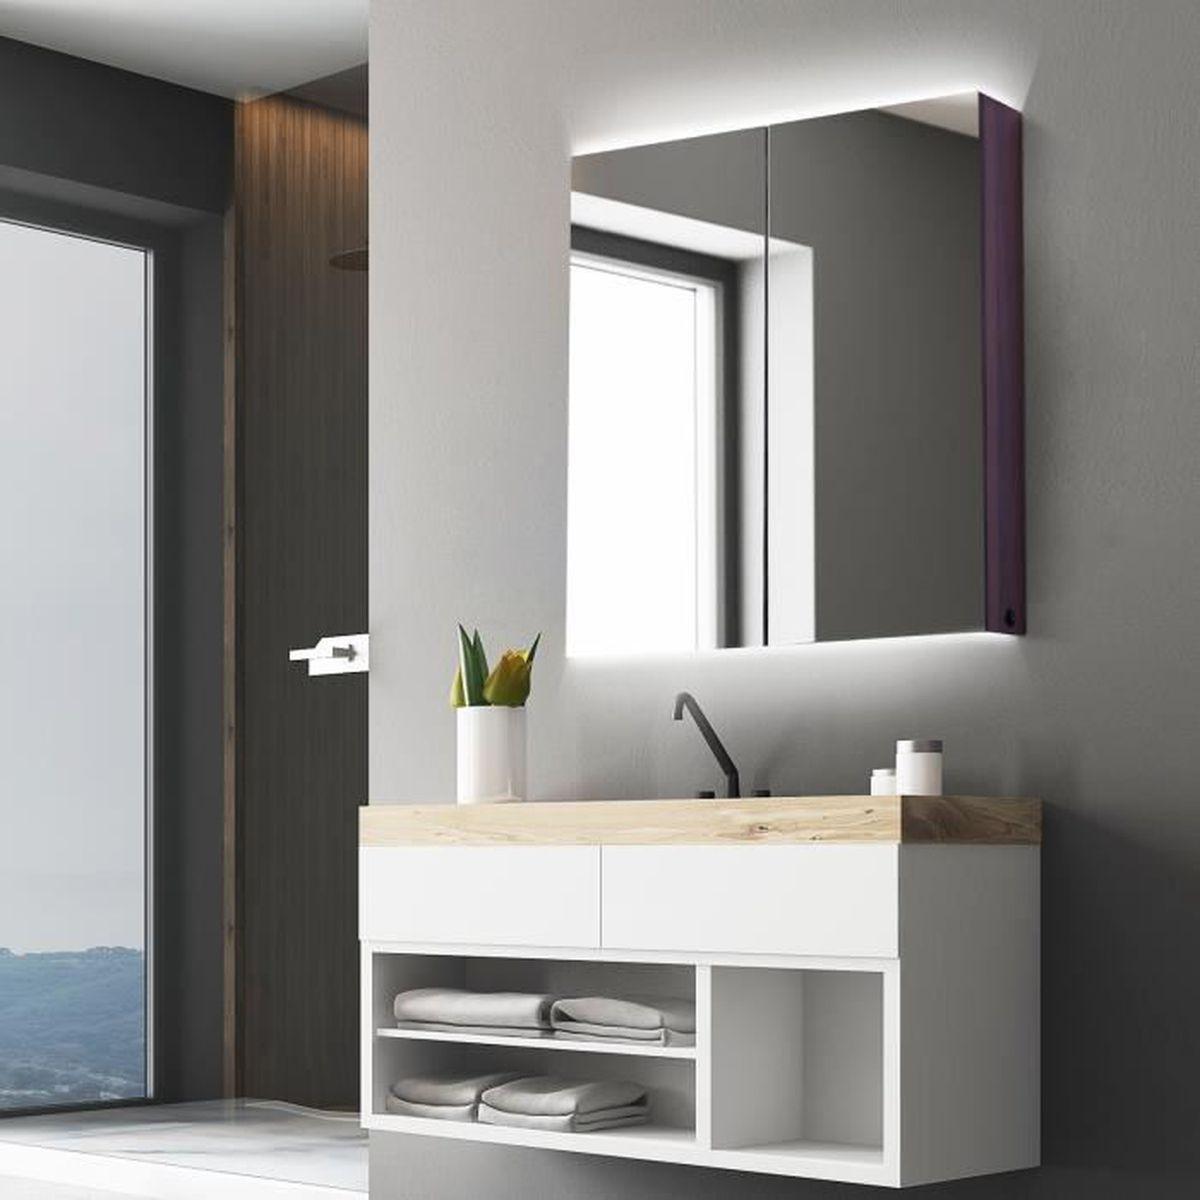 Miroir Eclairant Salle De Bain armoire lumineux salle de bains